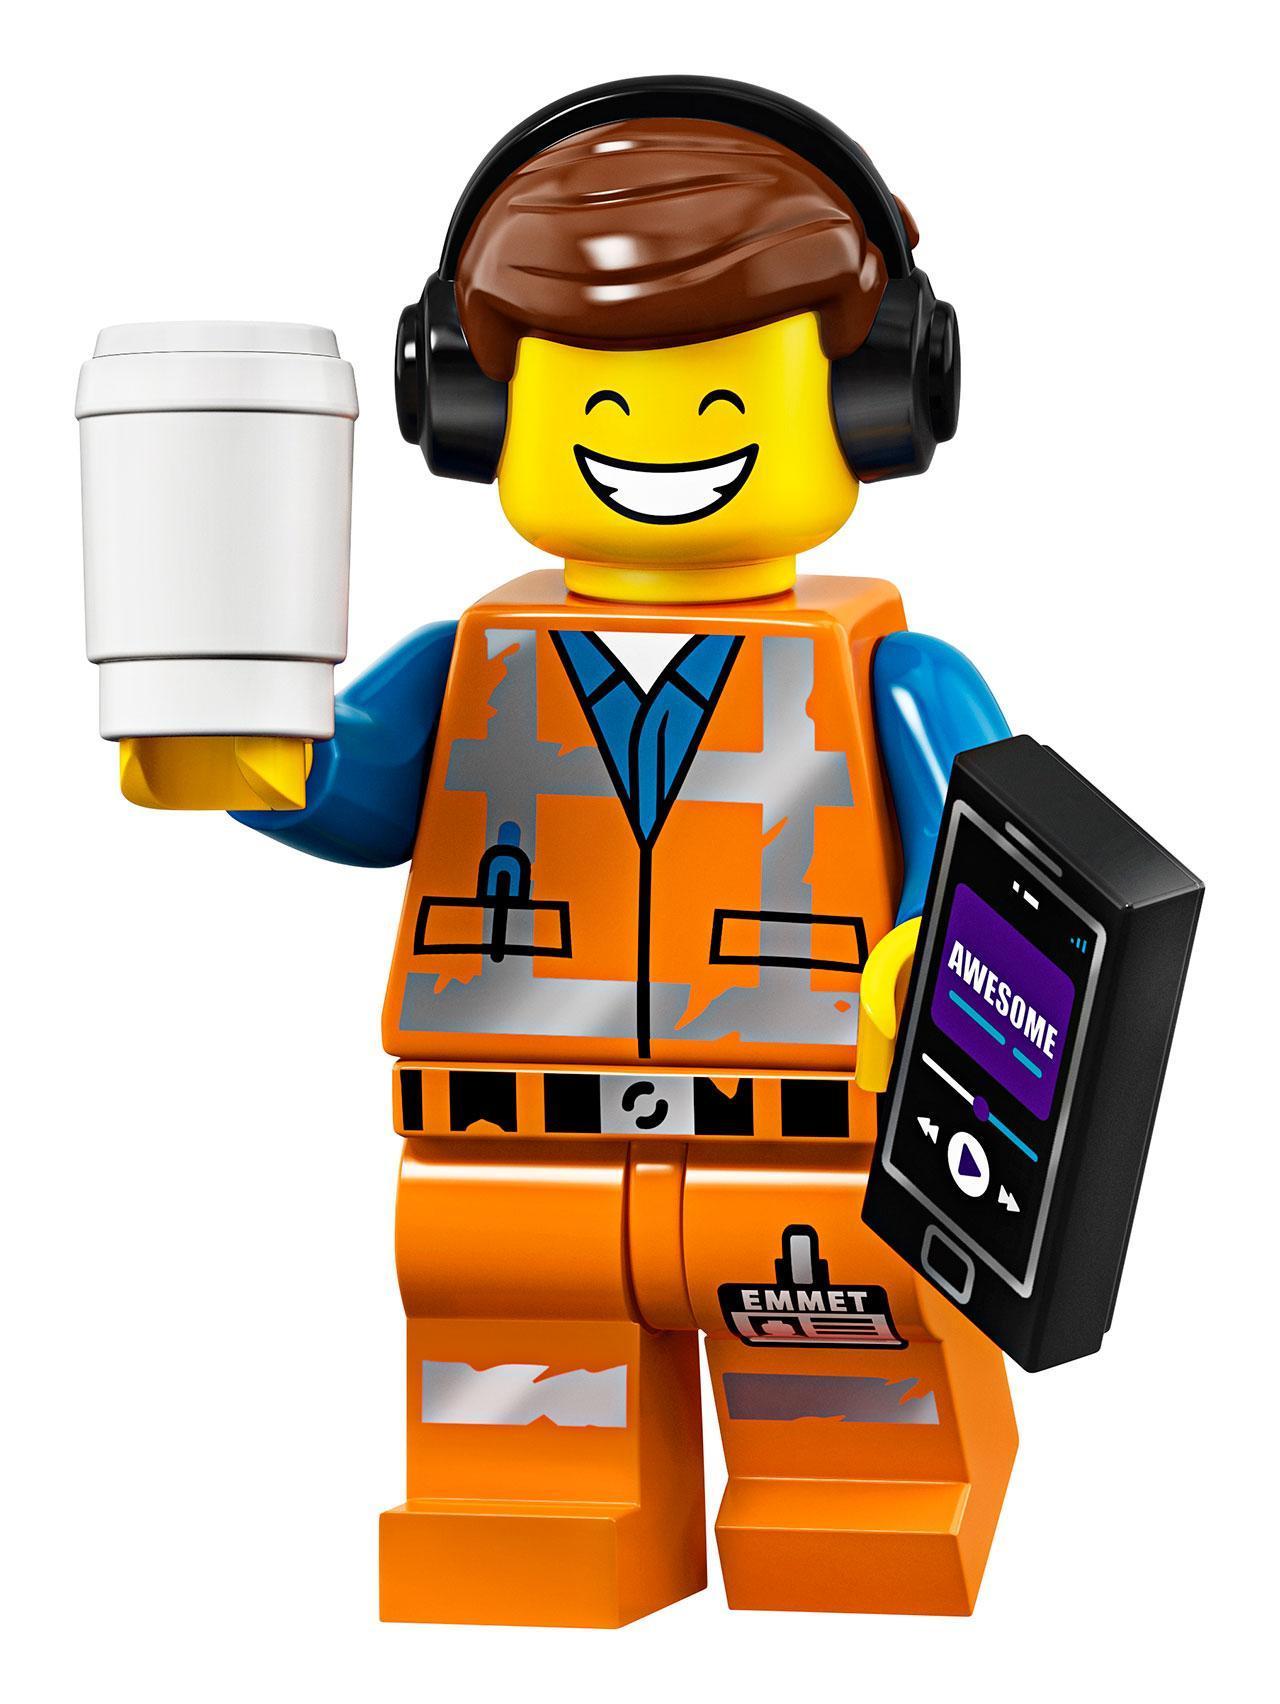 LEGO Movie 2 Minifigure packs revealed - SlashGear